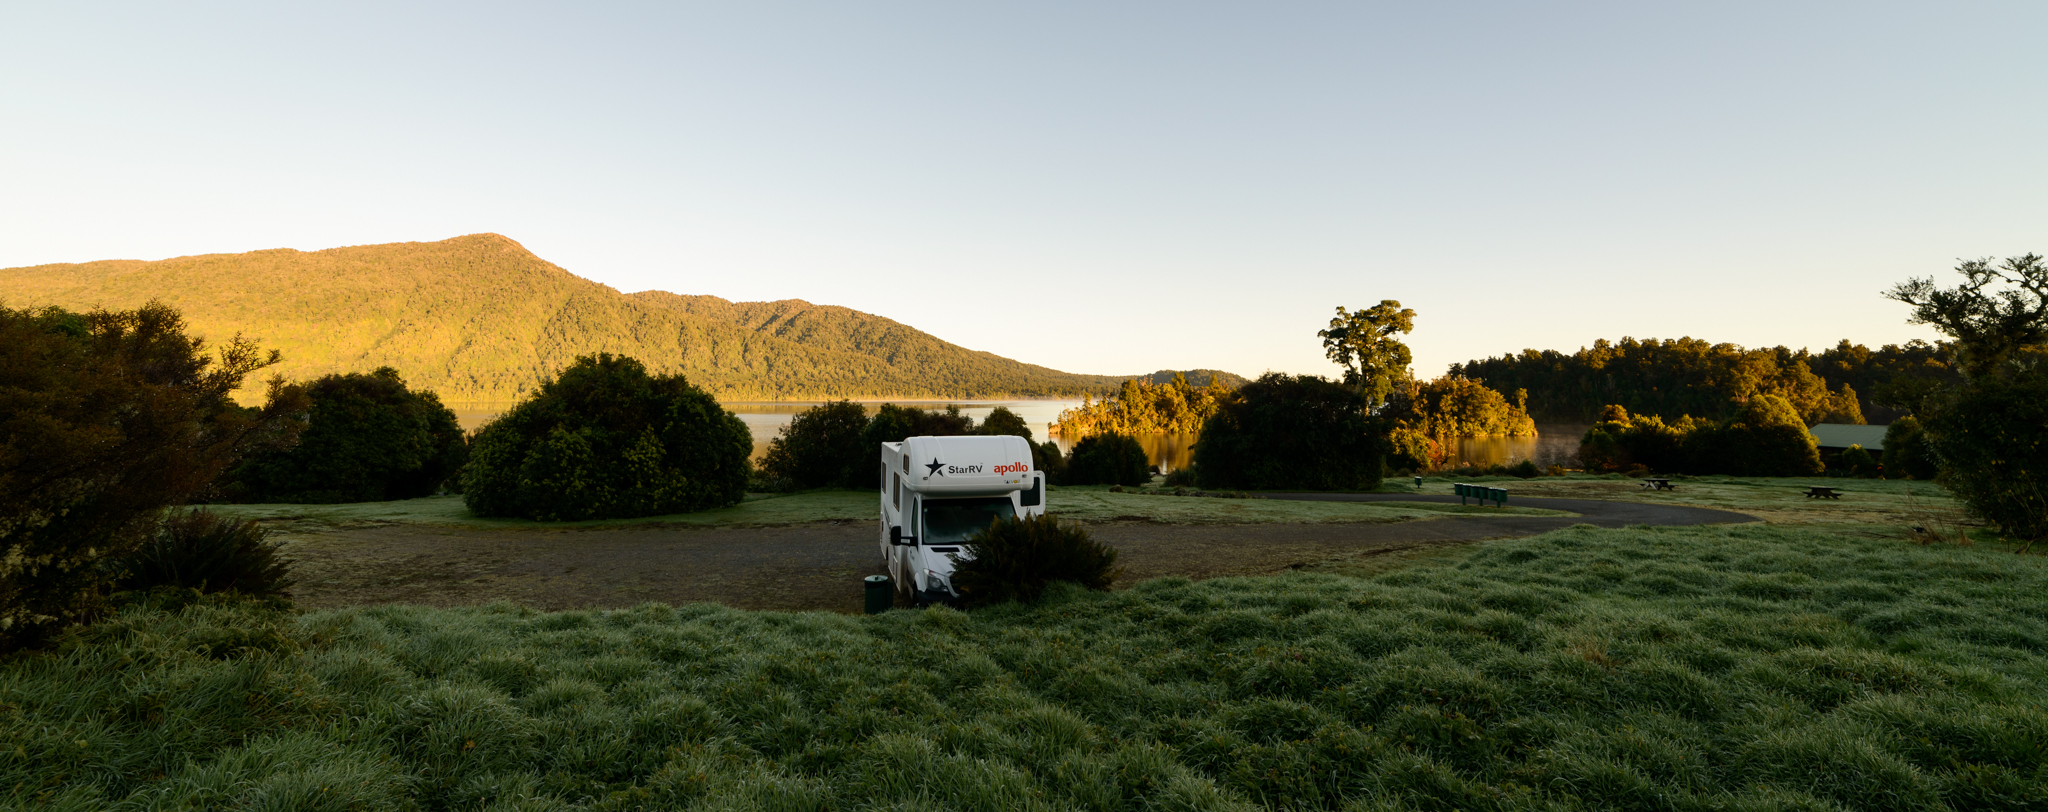 Camp site, Lake Kaniere